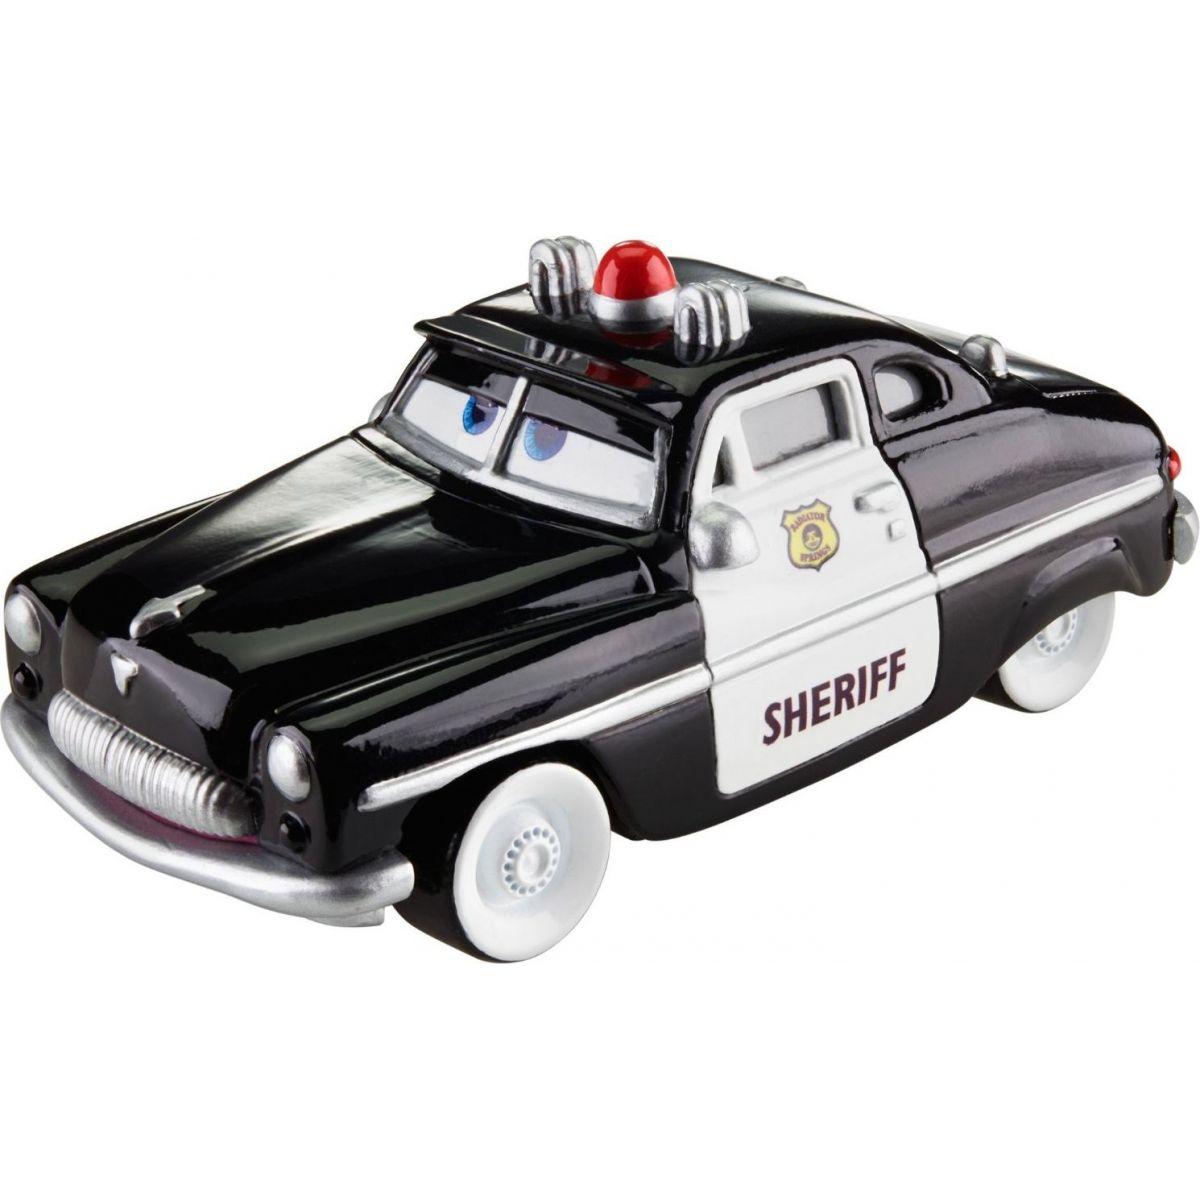 Mattel Cars 3 auta 12 cm Sheriff